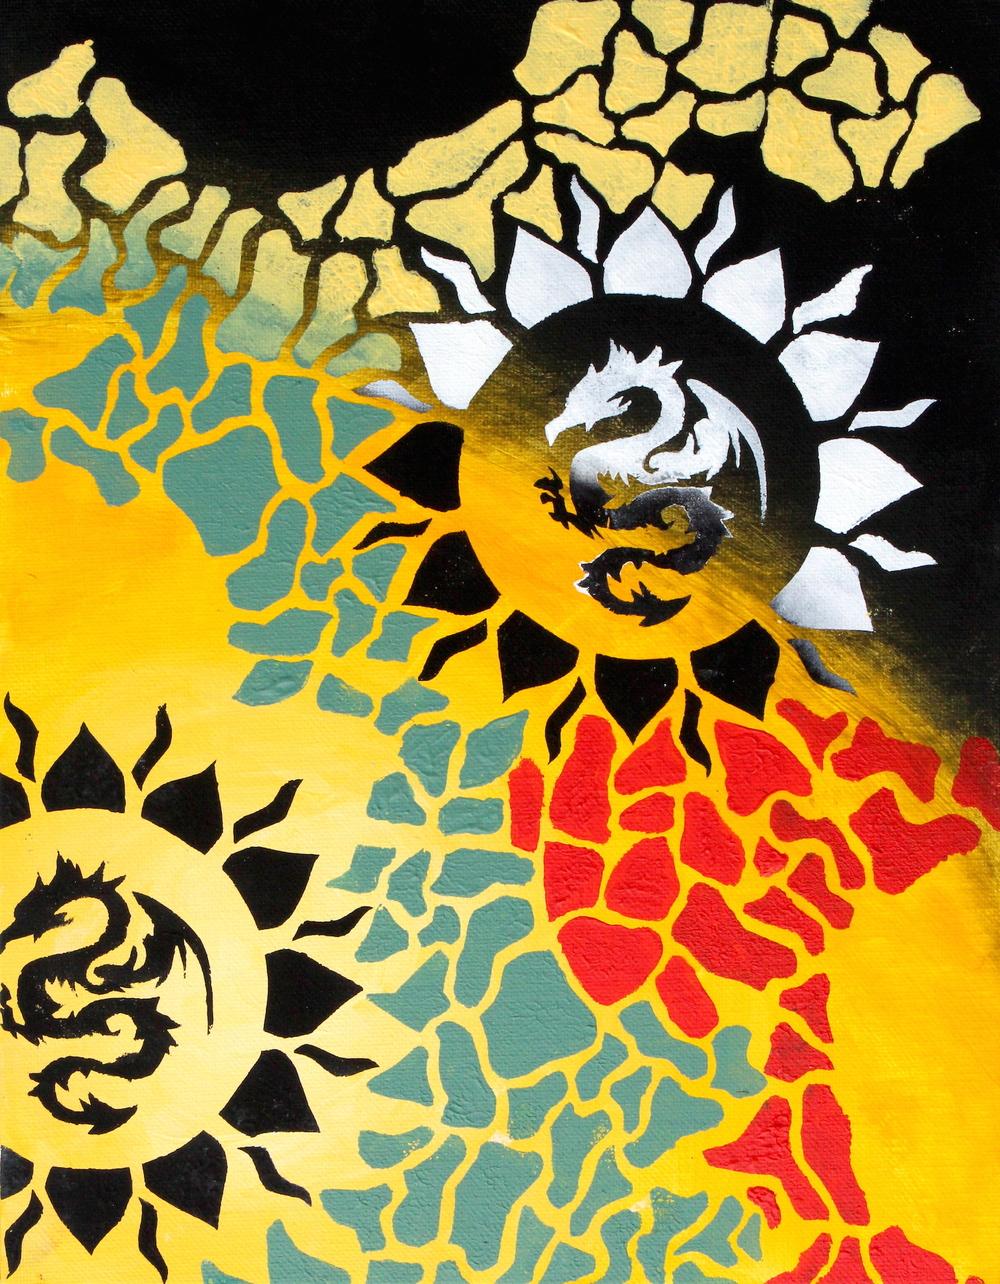 dragon stencil.JPG